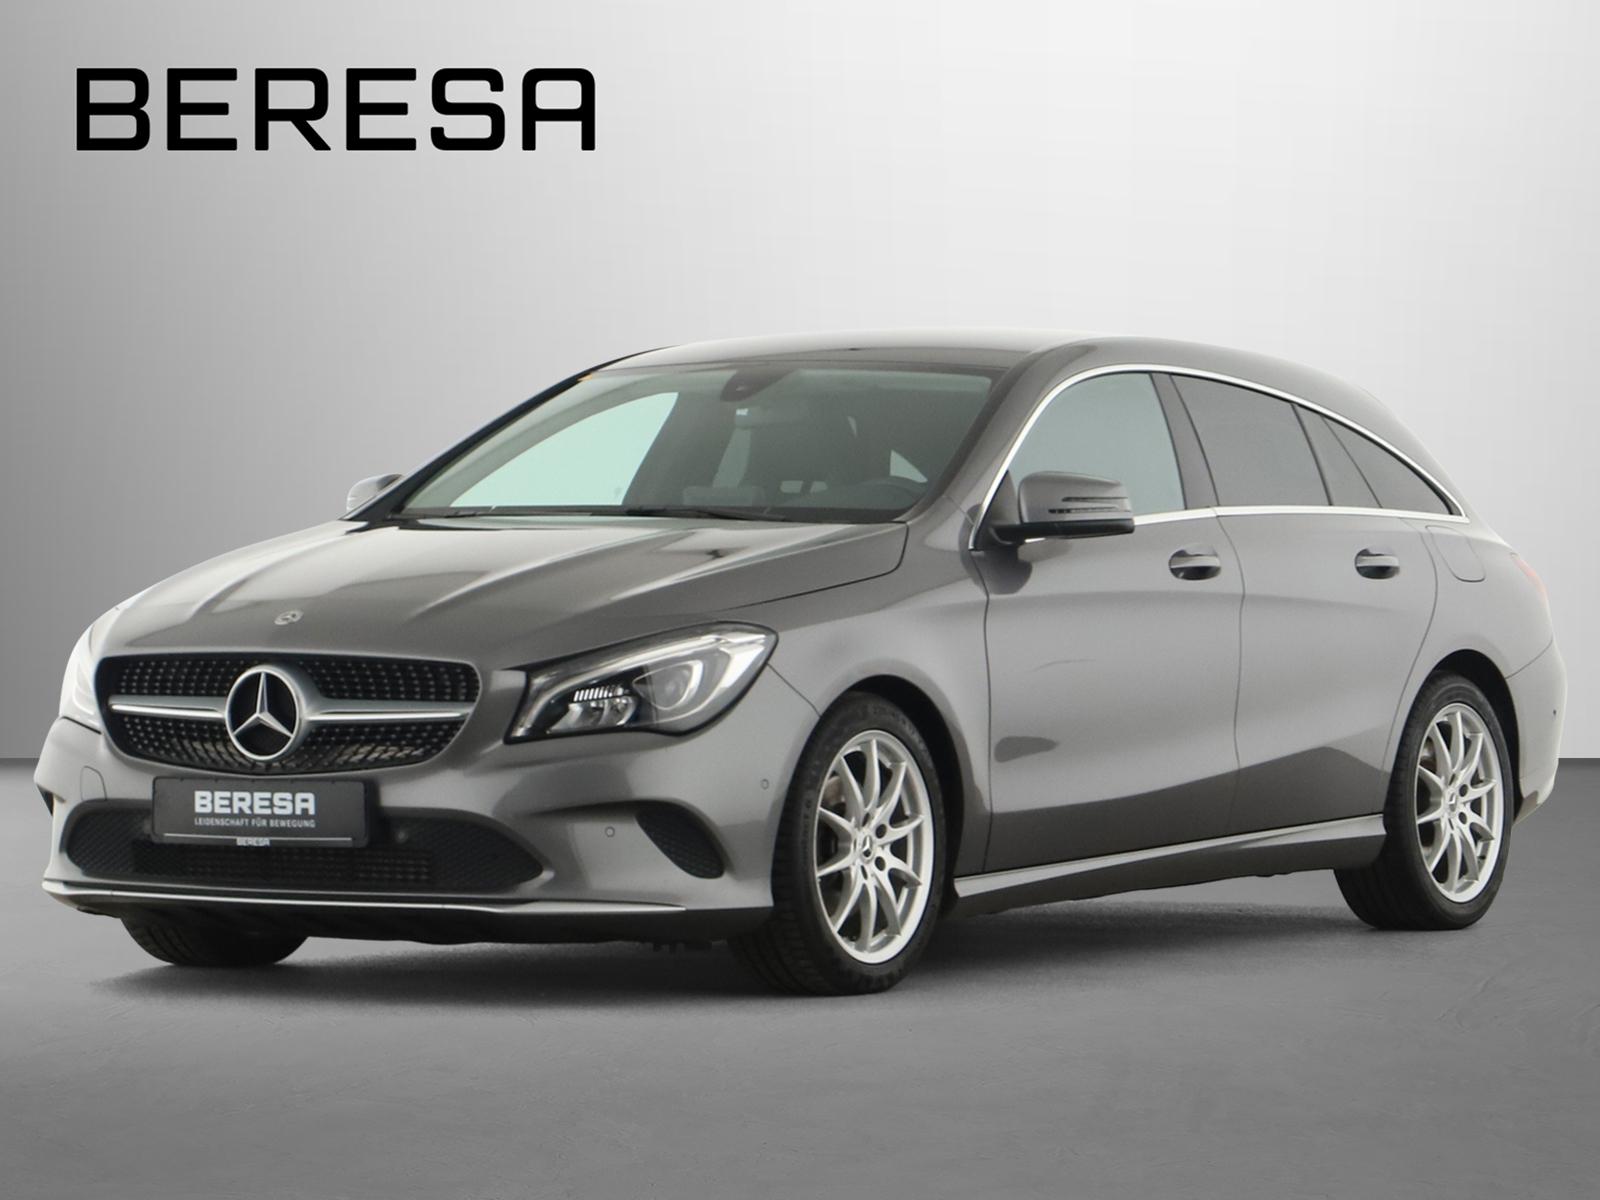 Mercedes-Benz CLA 220 d SB LED AHK Standhz Navi PDC, Jahr 2017, Diesel